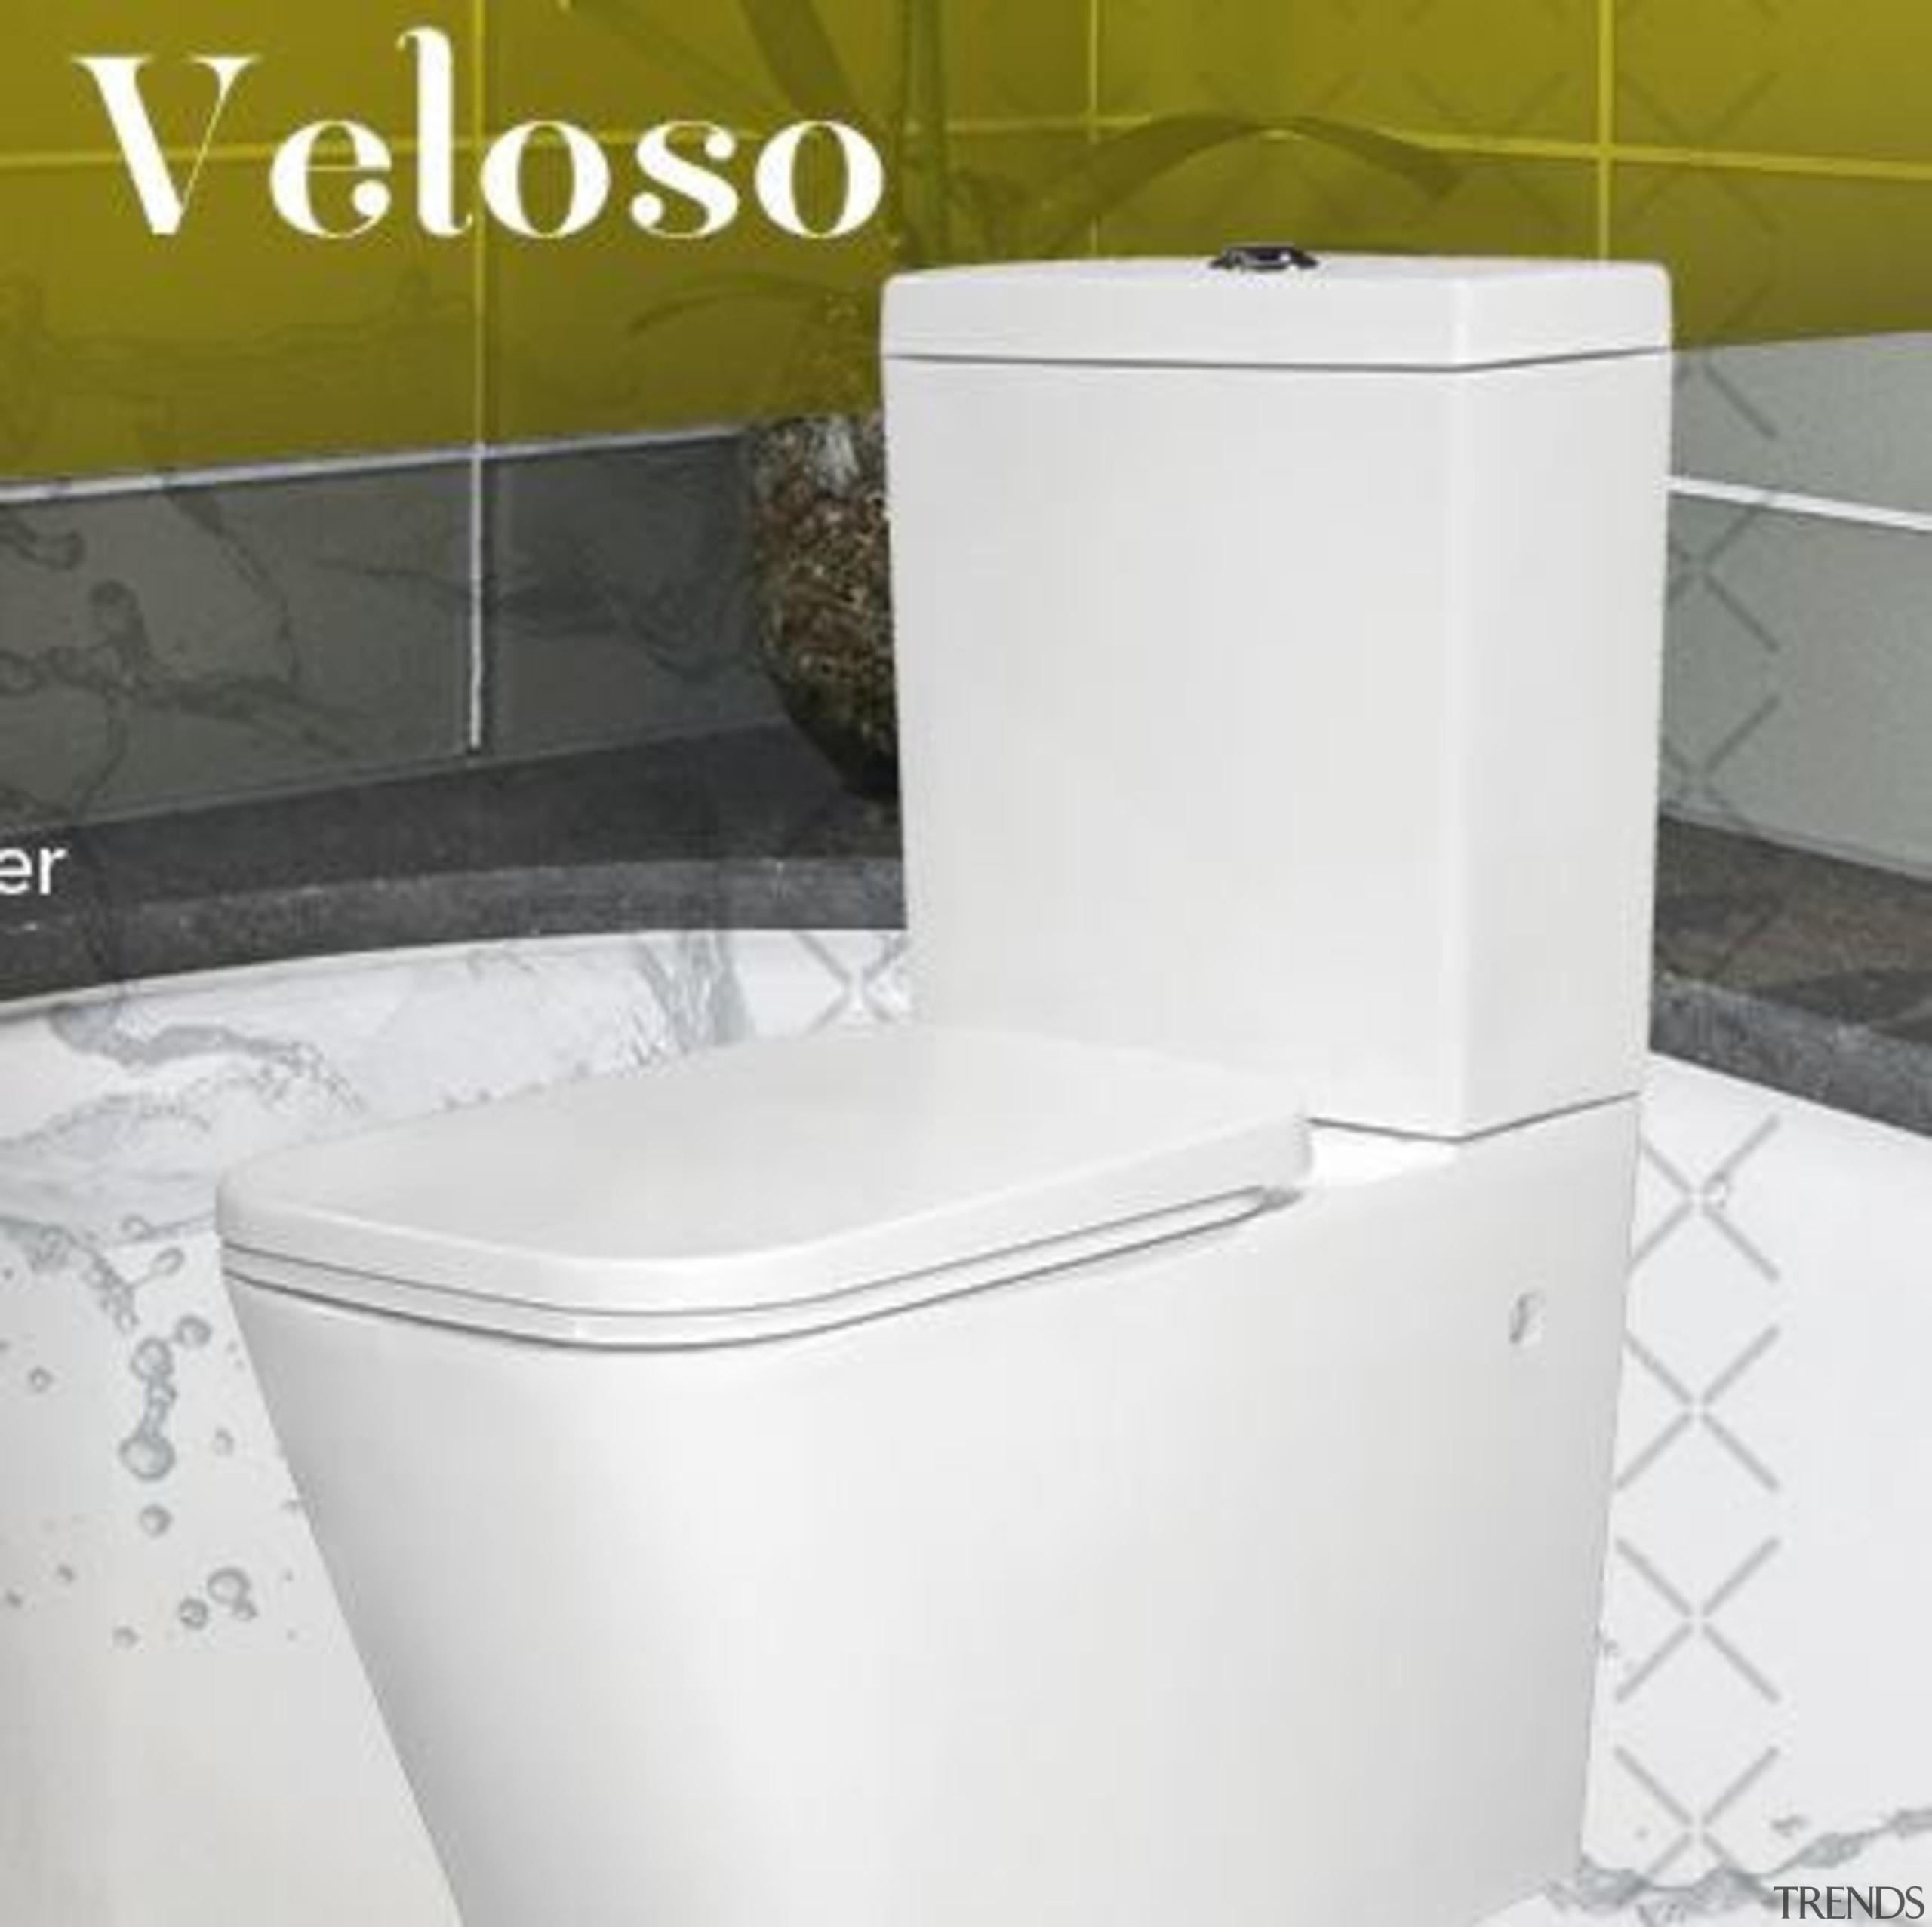 The latest design trend for the bathroom. Toilet plumbing fixture, product, toilet, toilet seat, white